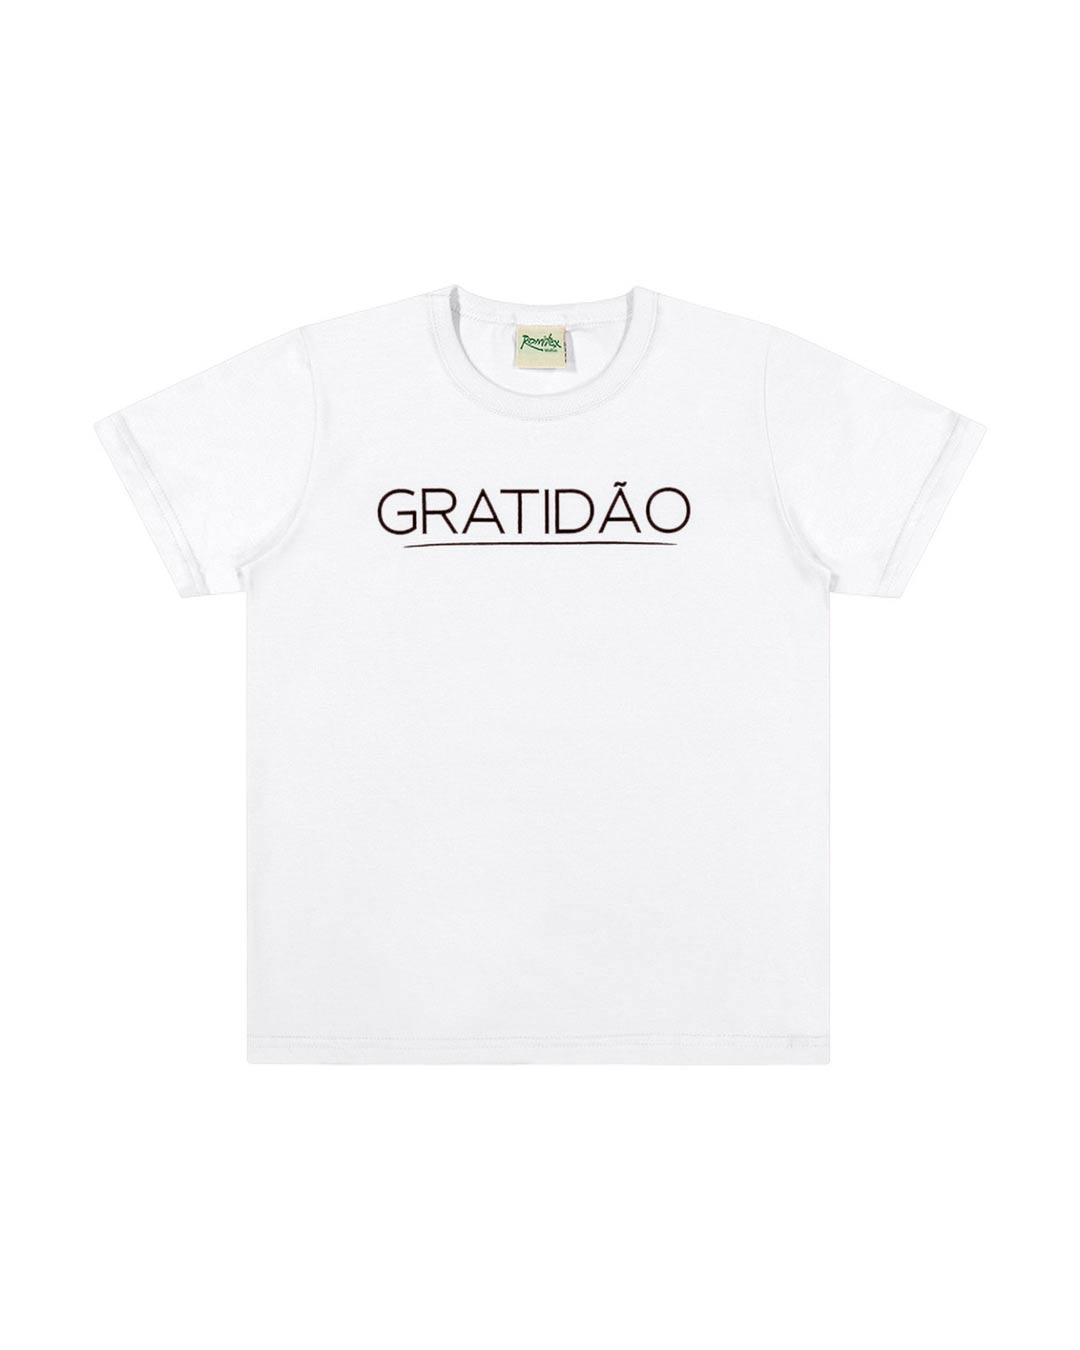 Camiseta Infantil Gratidão - Romitex